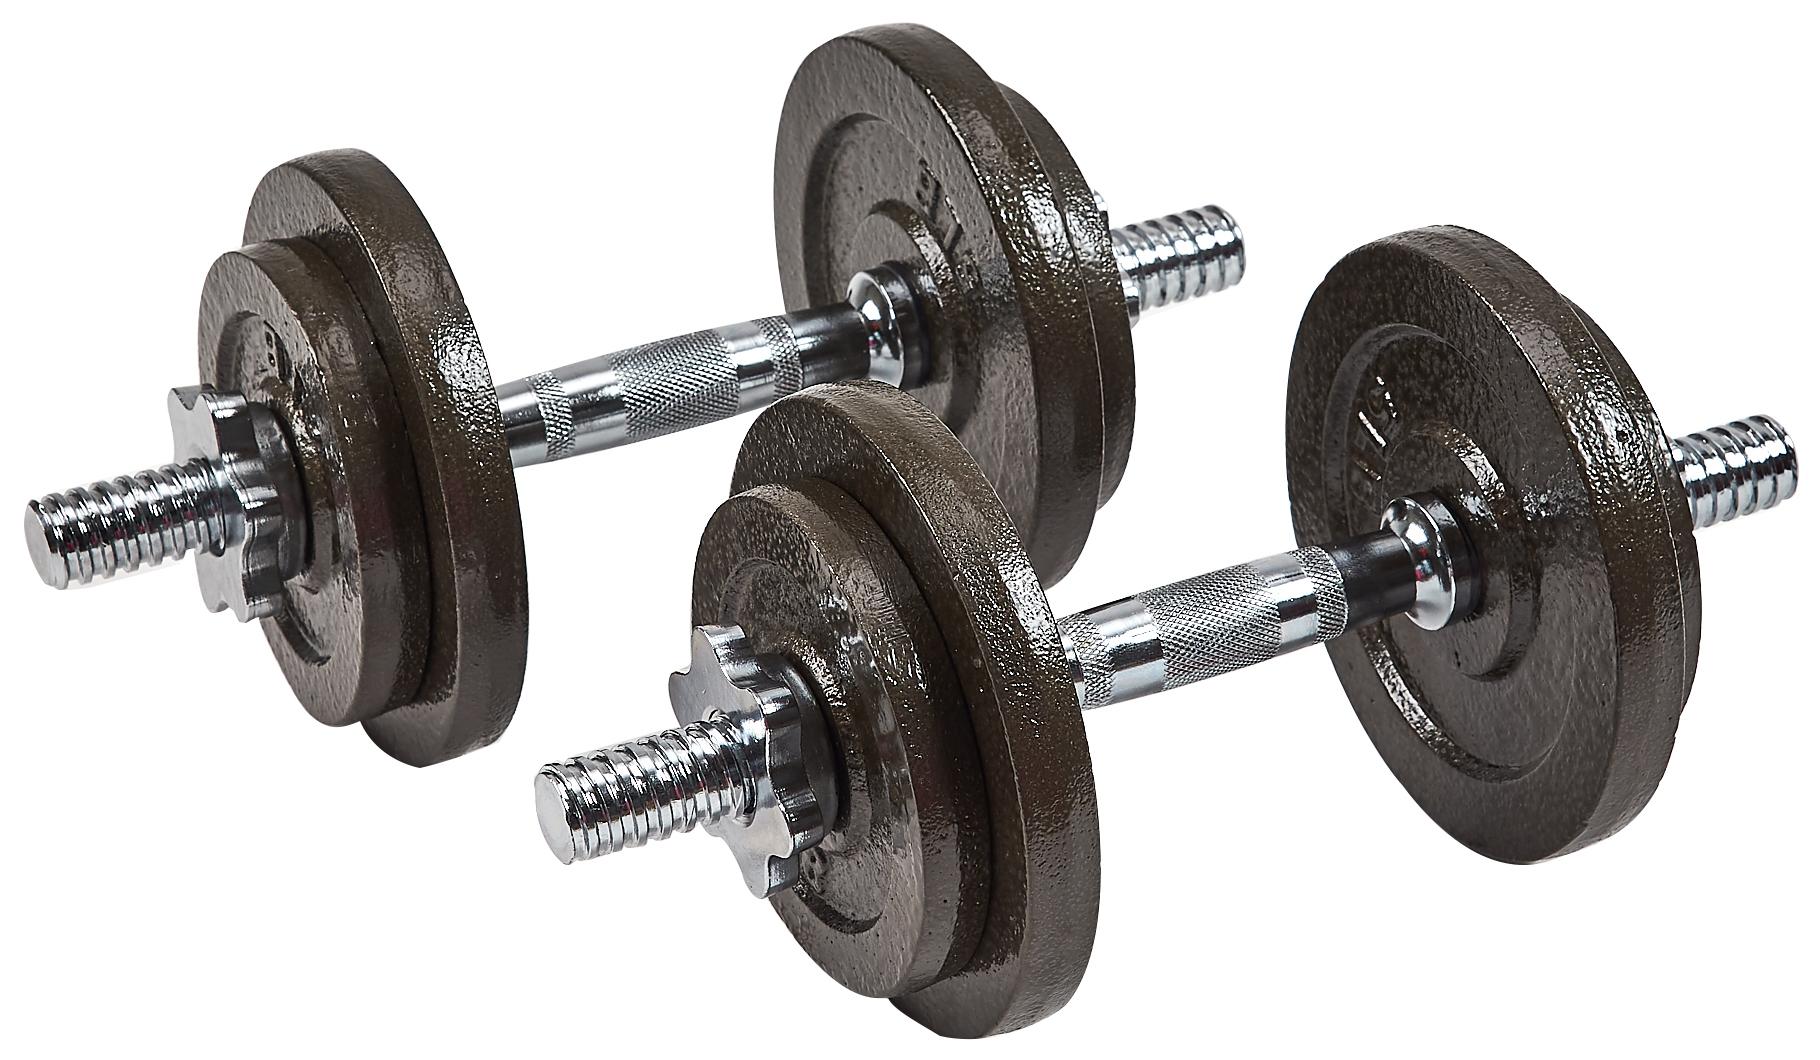 Everyday Essentials Contoured Handle Cast Iron Adjustable Dumbbell Weight Set  $70